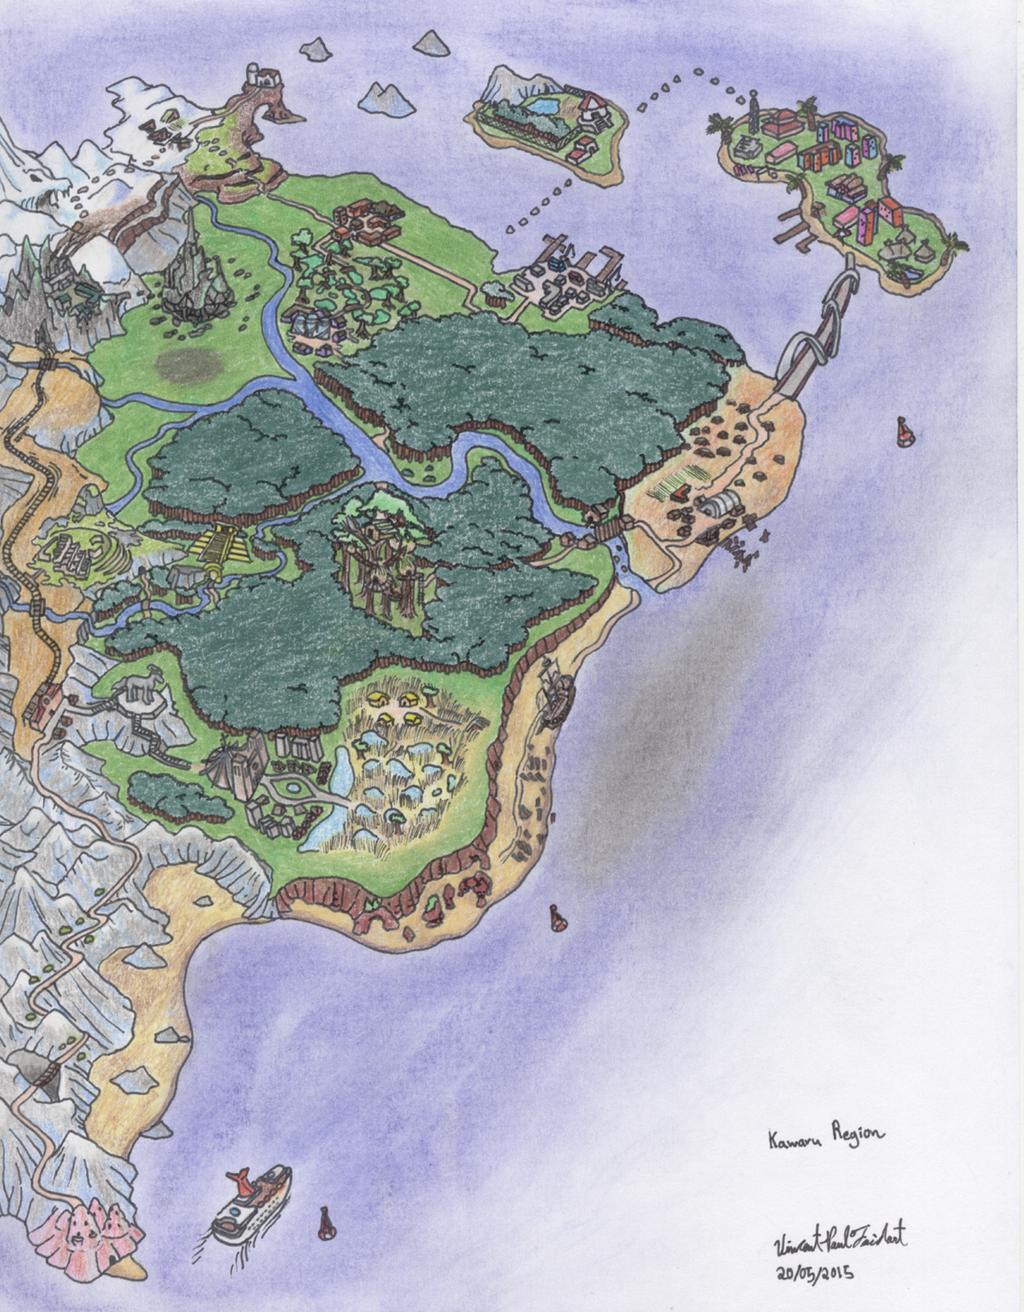 Pokemon Kawaru Region by Tapejara on DeviantArt